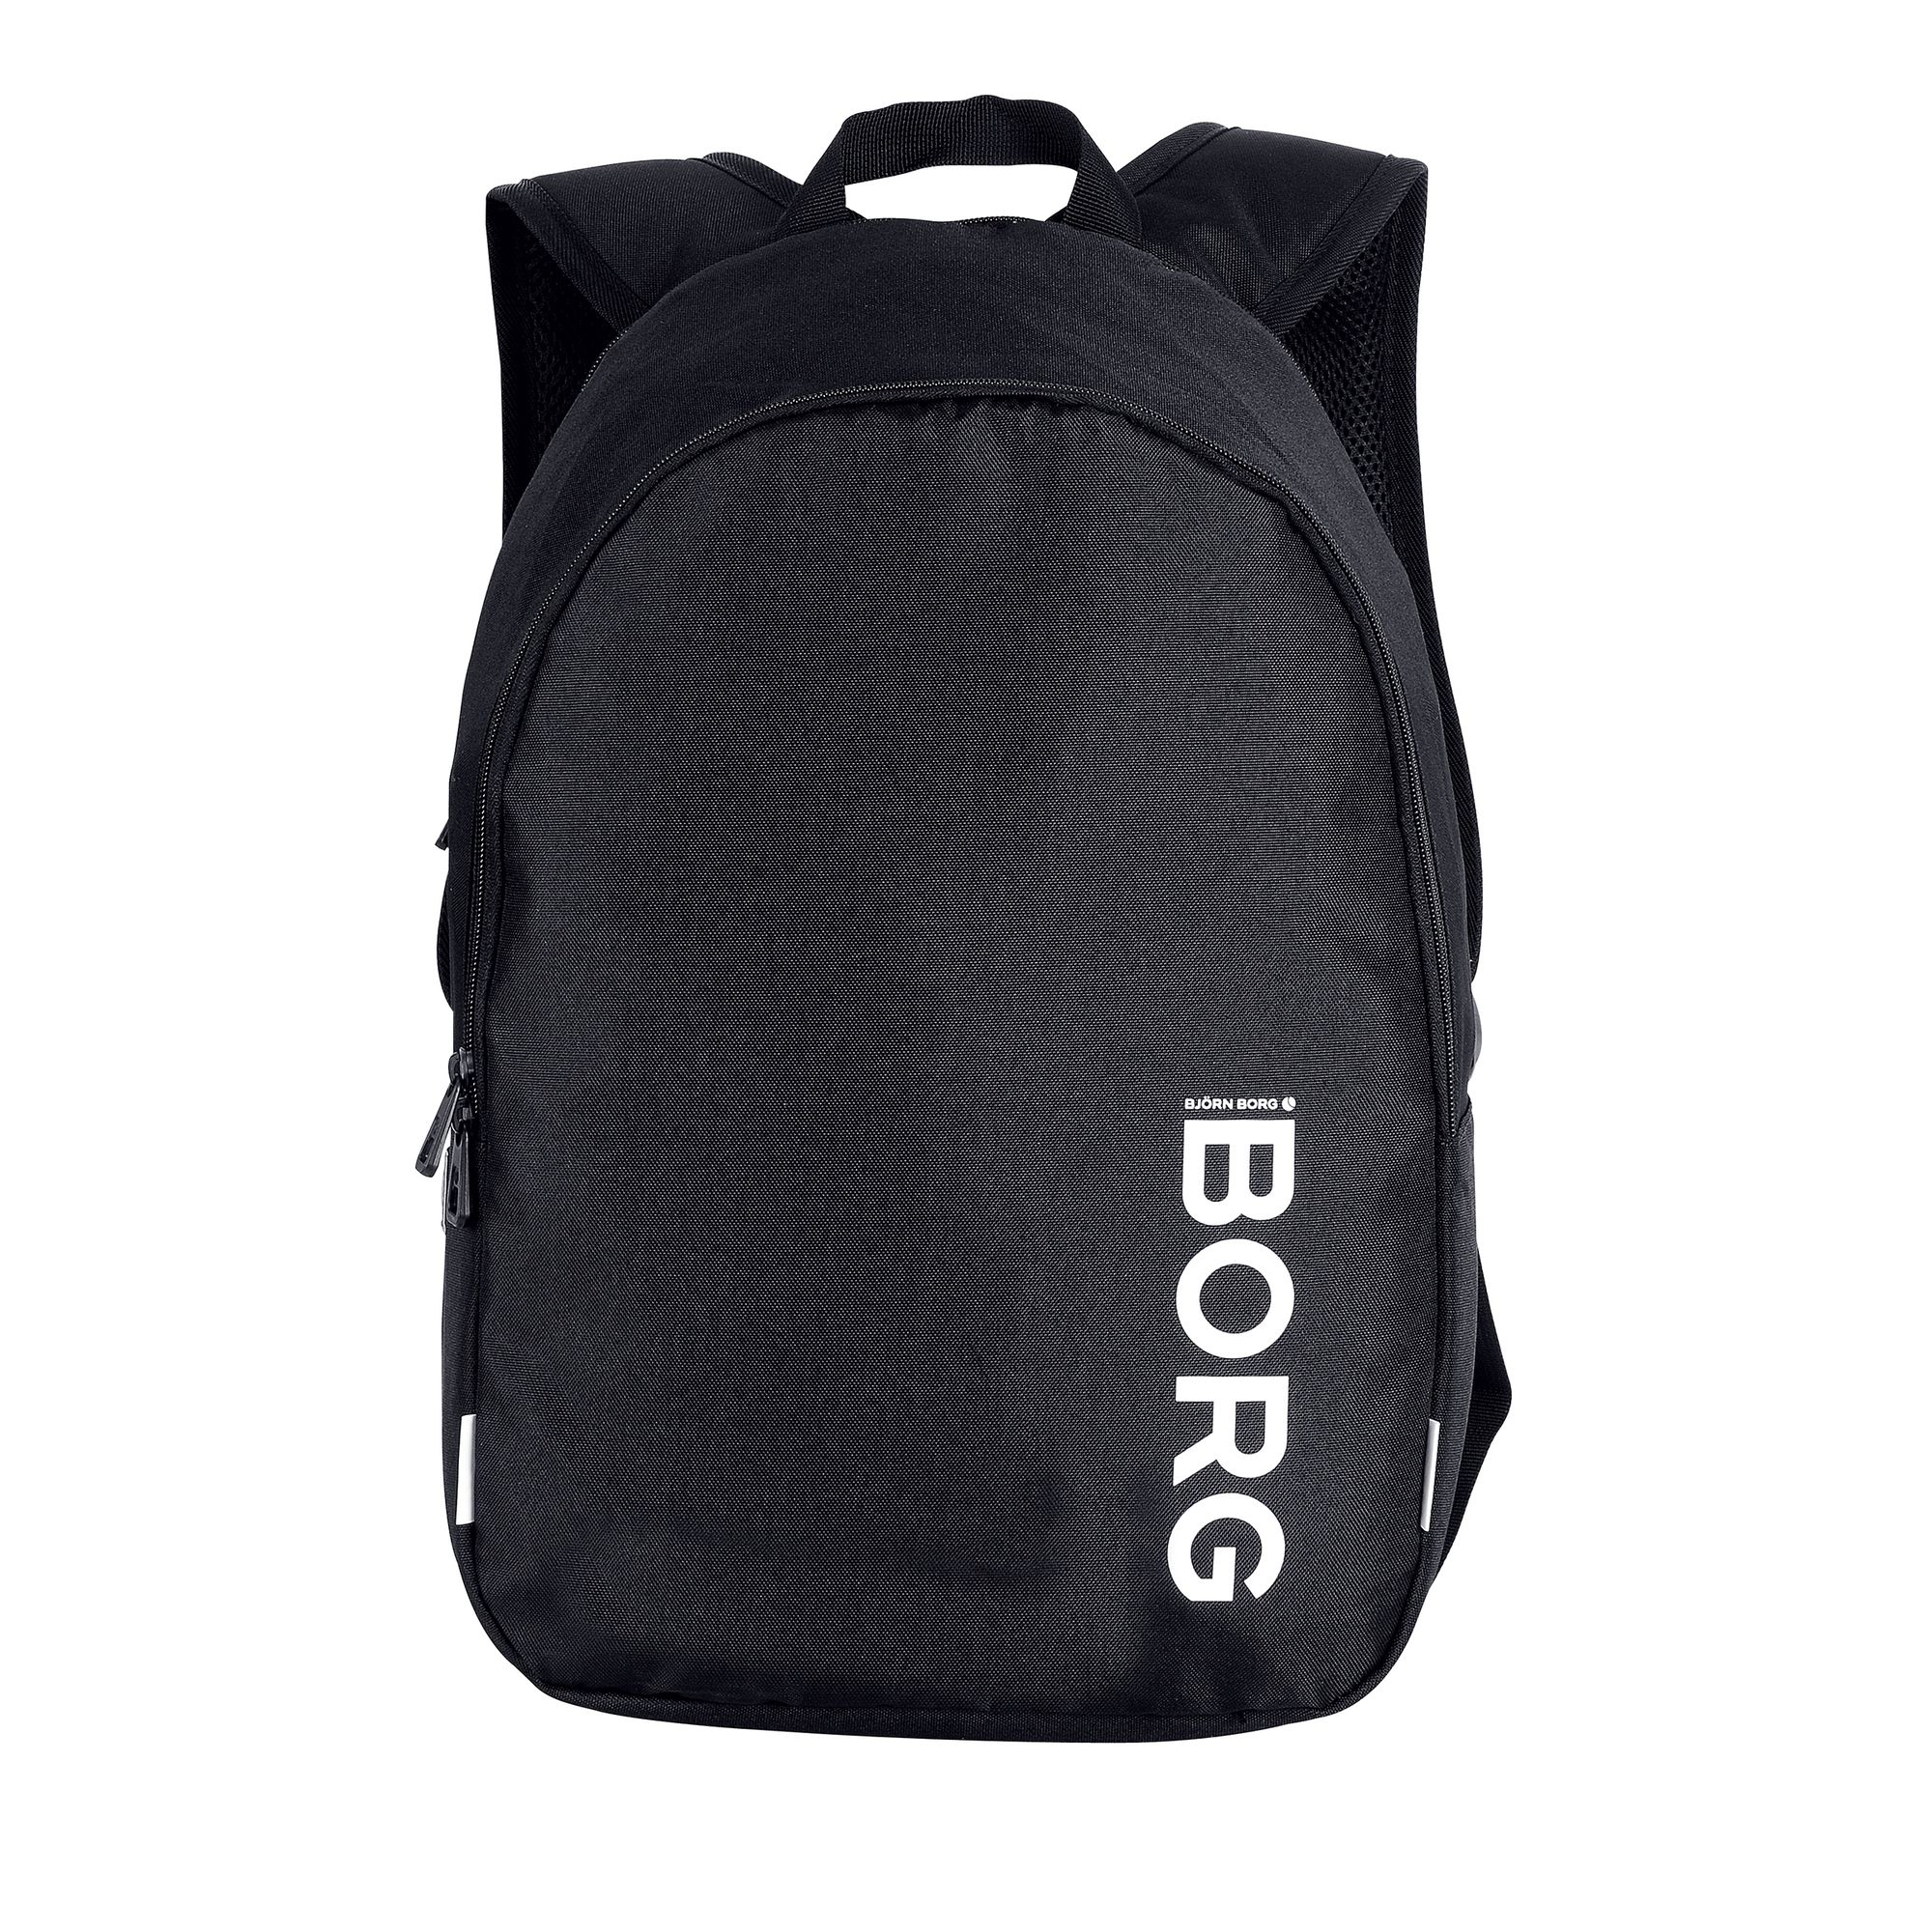 Björn Borg Core 7043 ryggsäck, Svart